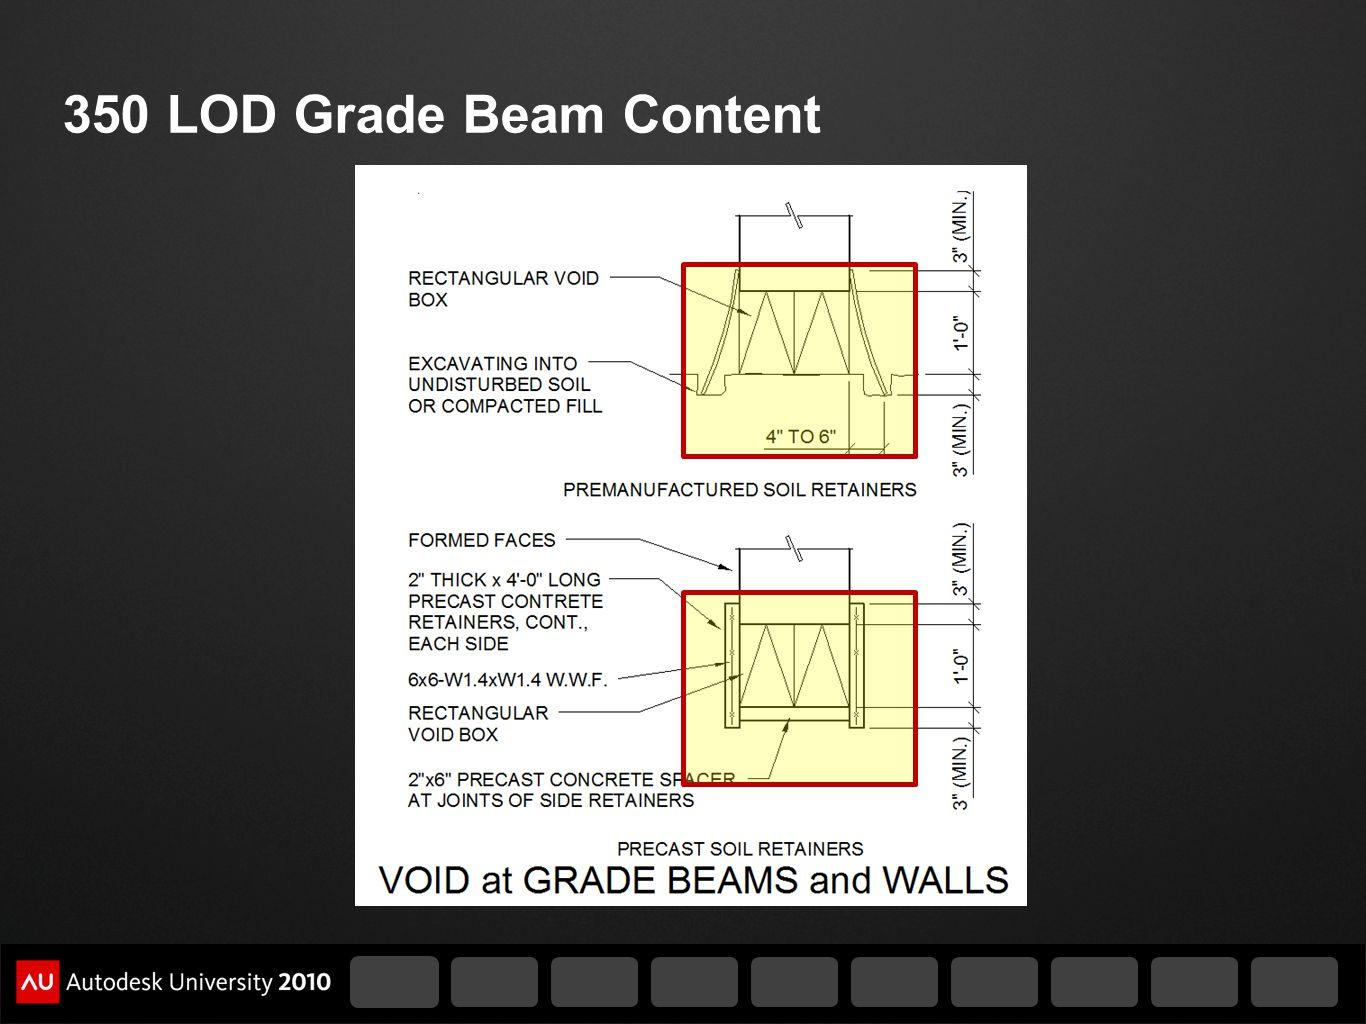 350 LOD Grade Beam Content